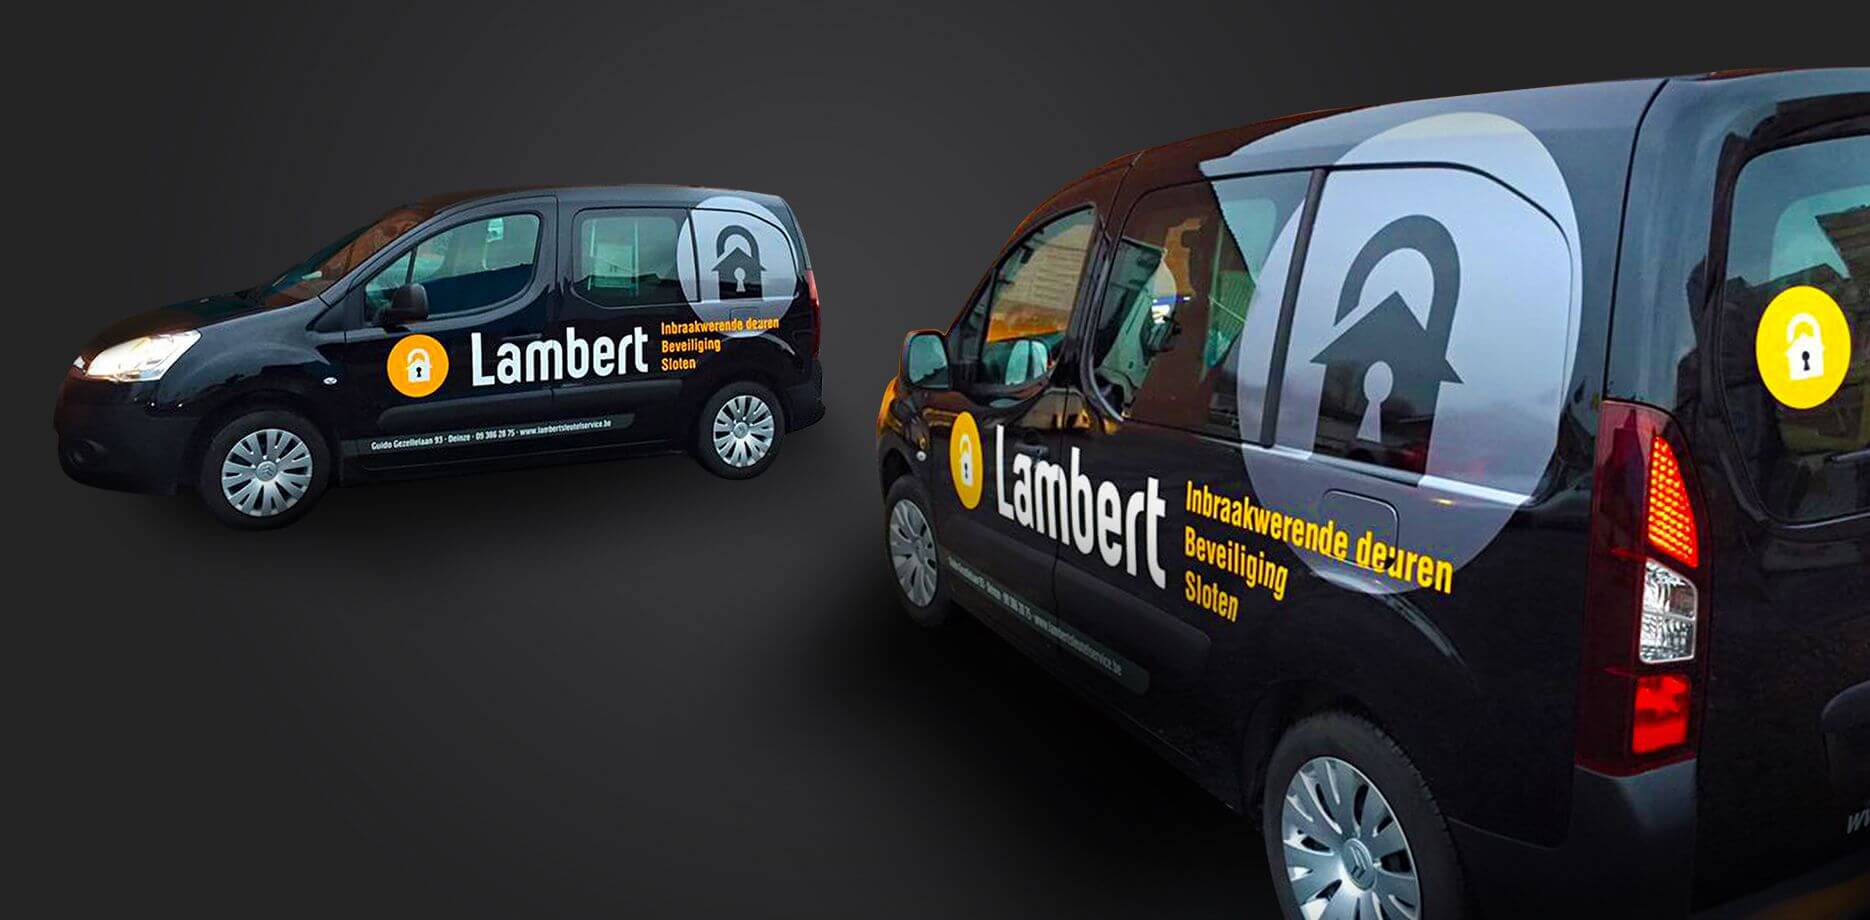 Sleutelservice Lambert voertuigbelettering